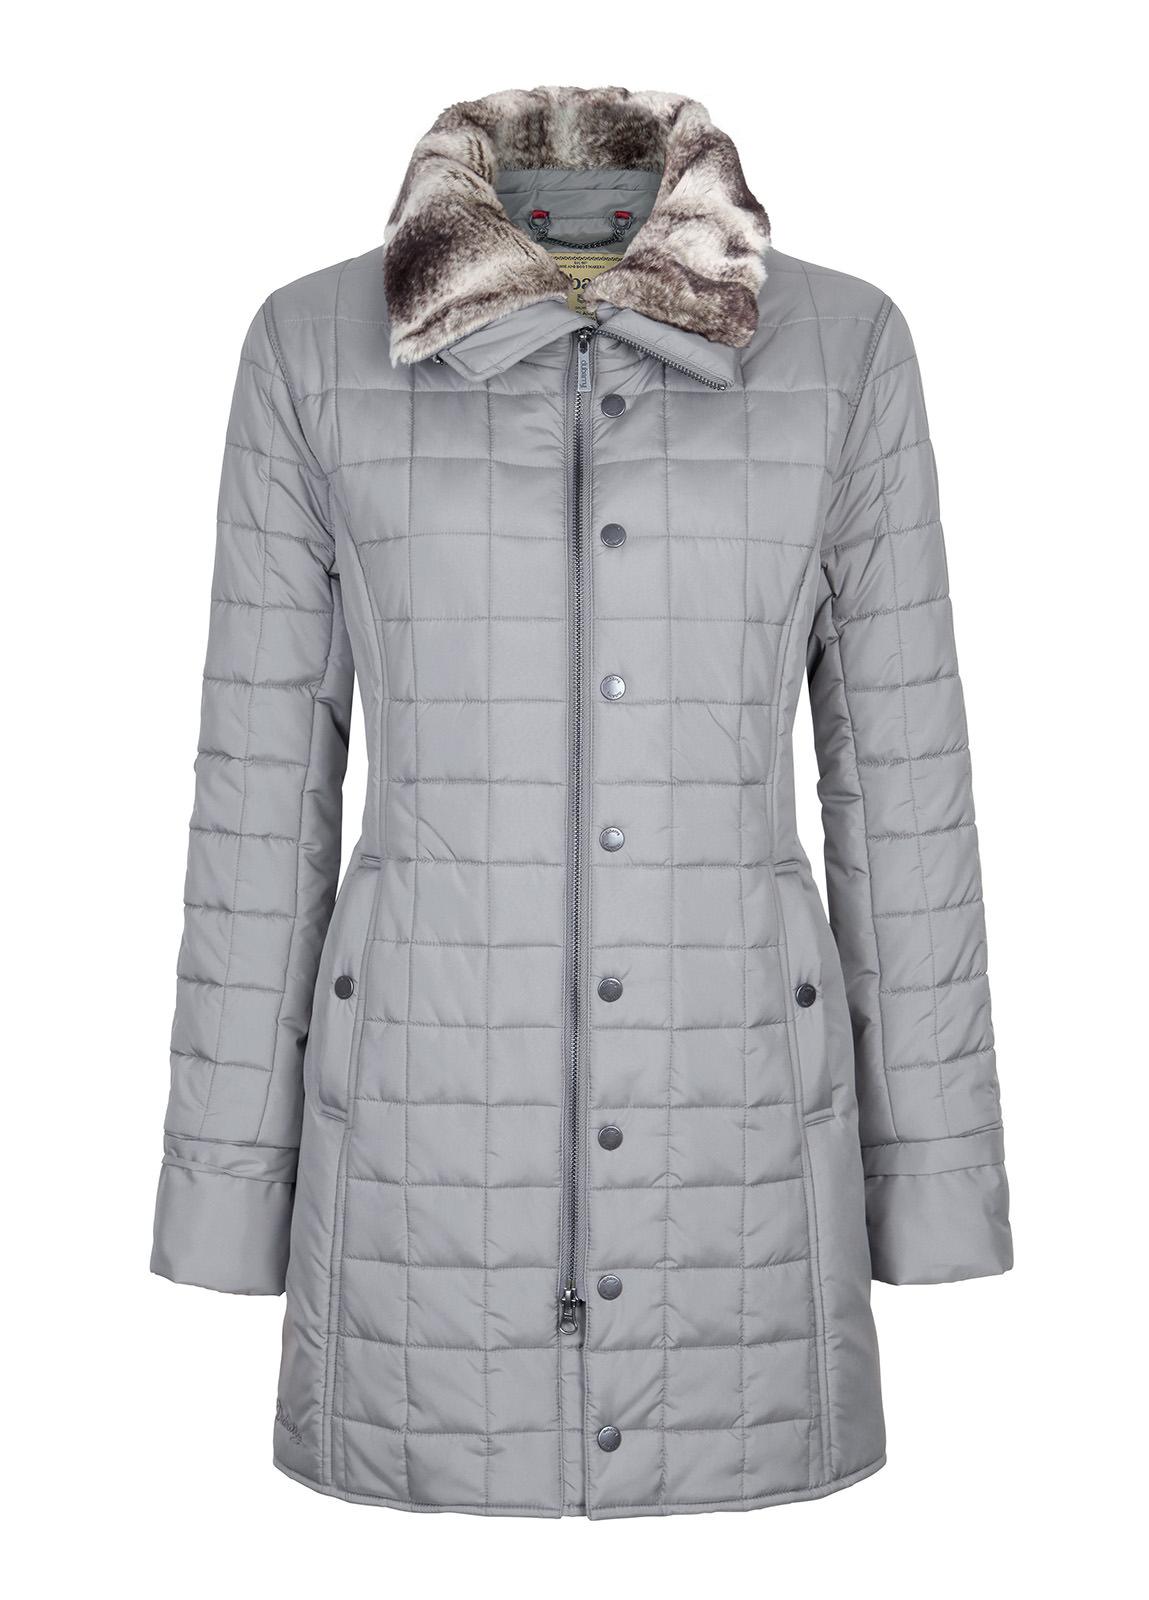 Dubarry_Erin Women's Quilted Coat - Light Grey_Image_2